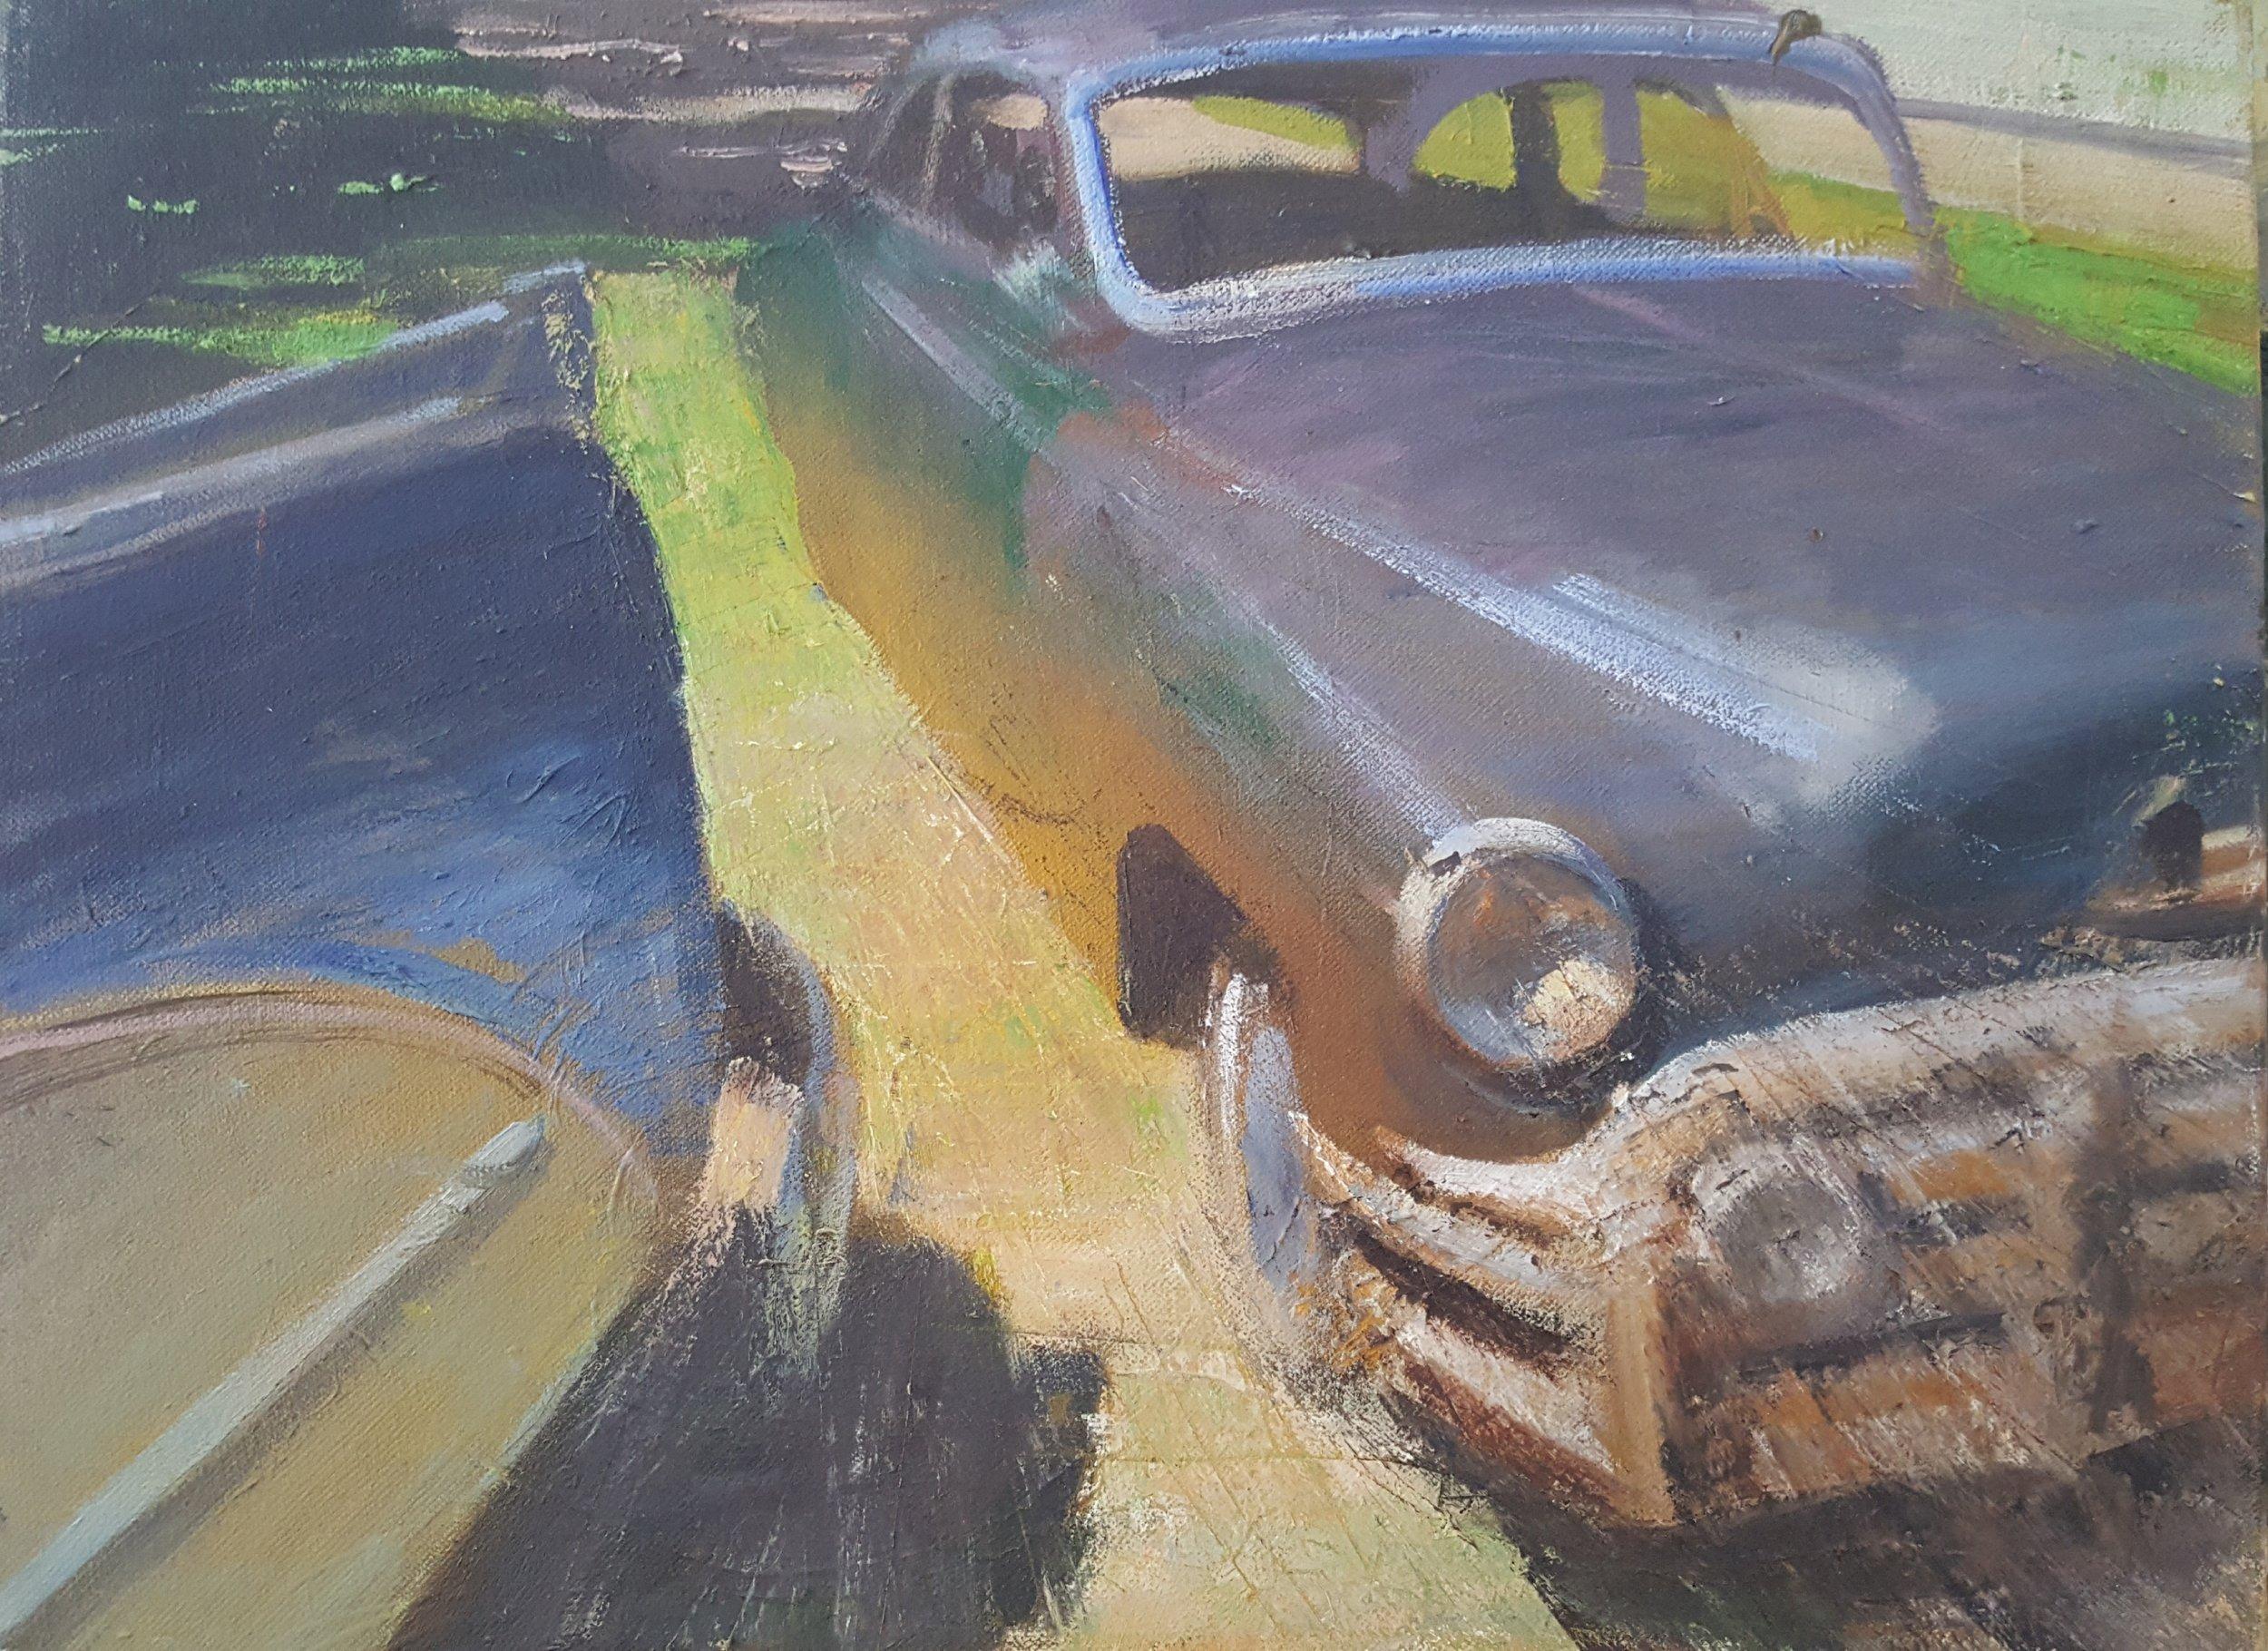 Rick's Driveway, Old Cars